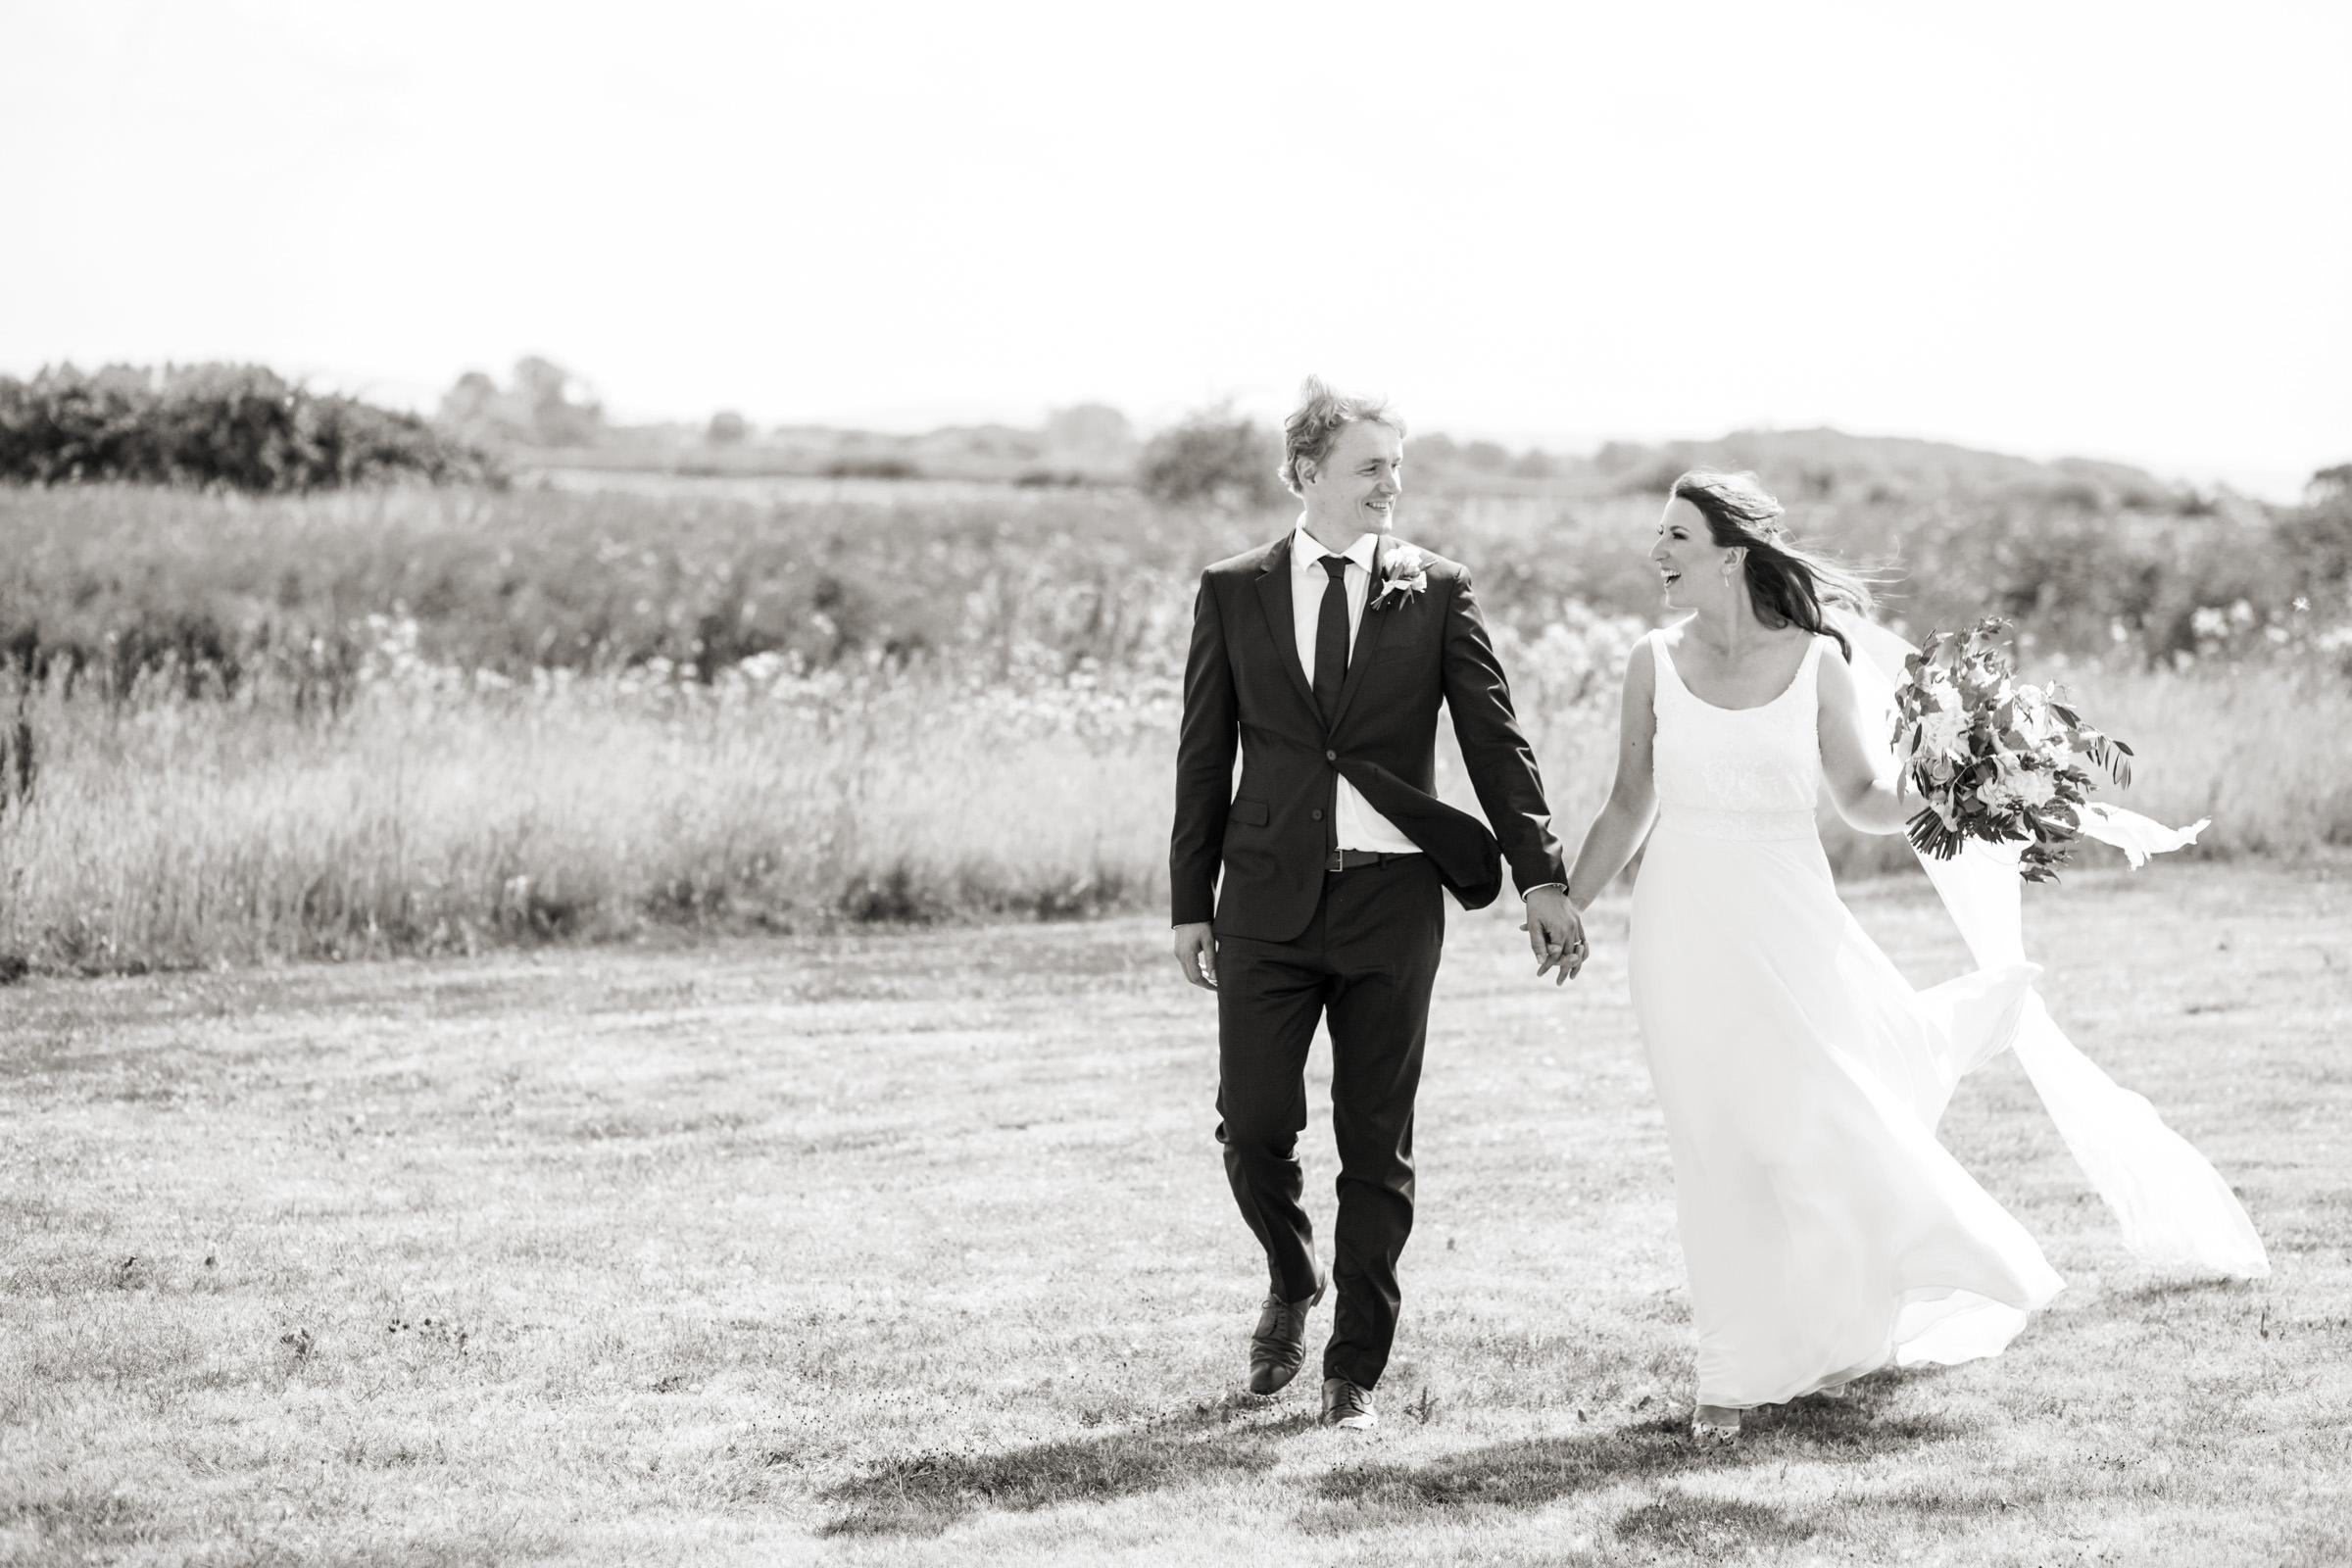 wedding photography at Gins Barn 020.jpg